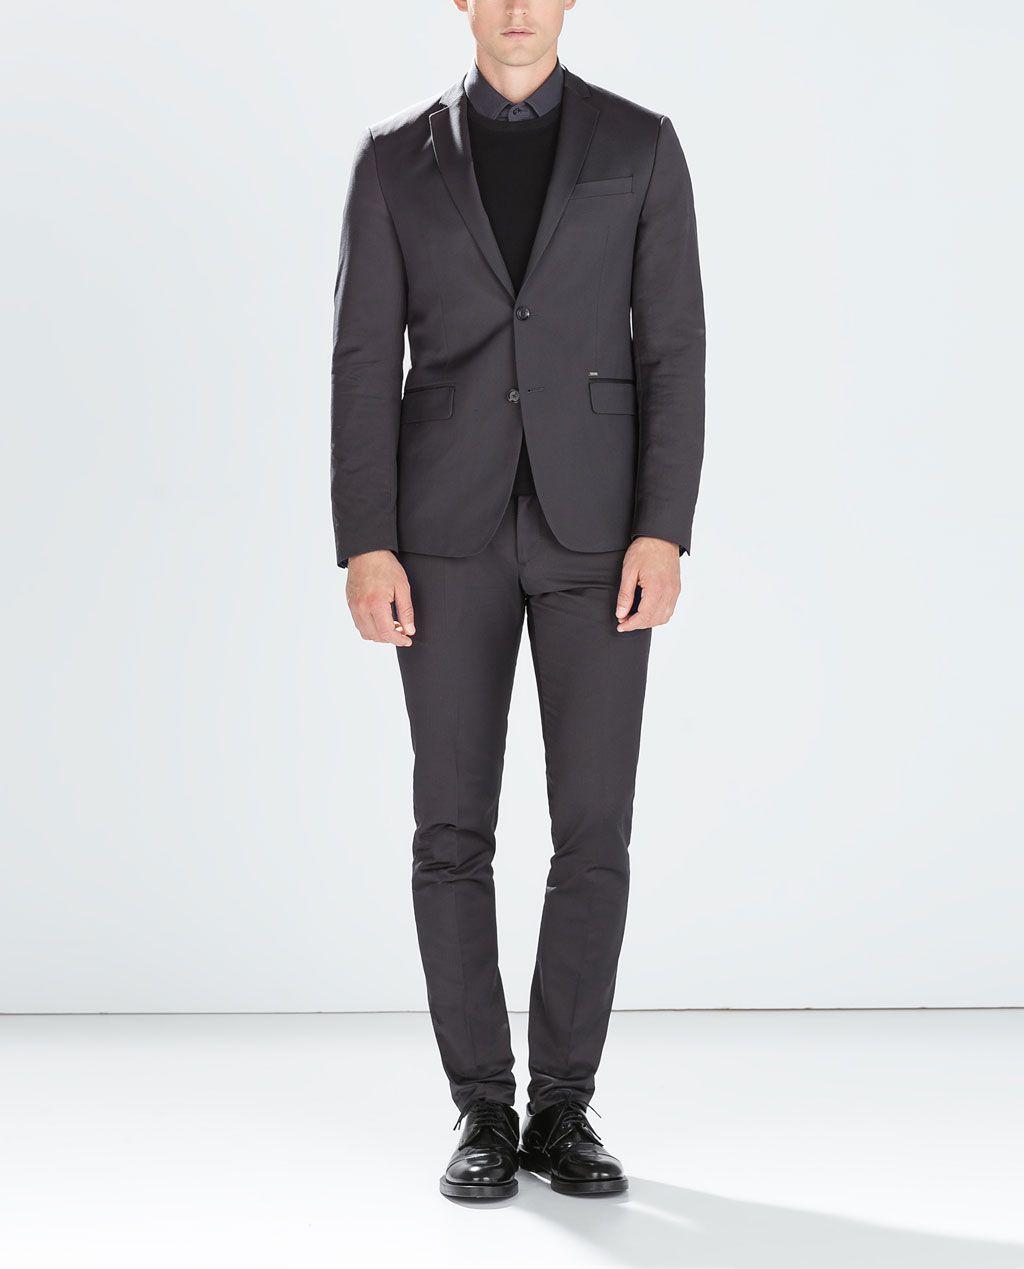 9ad69760d ZARA ANTHRACITE GREY SUIT (Blazer £89.99) (Trousers £45.99)